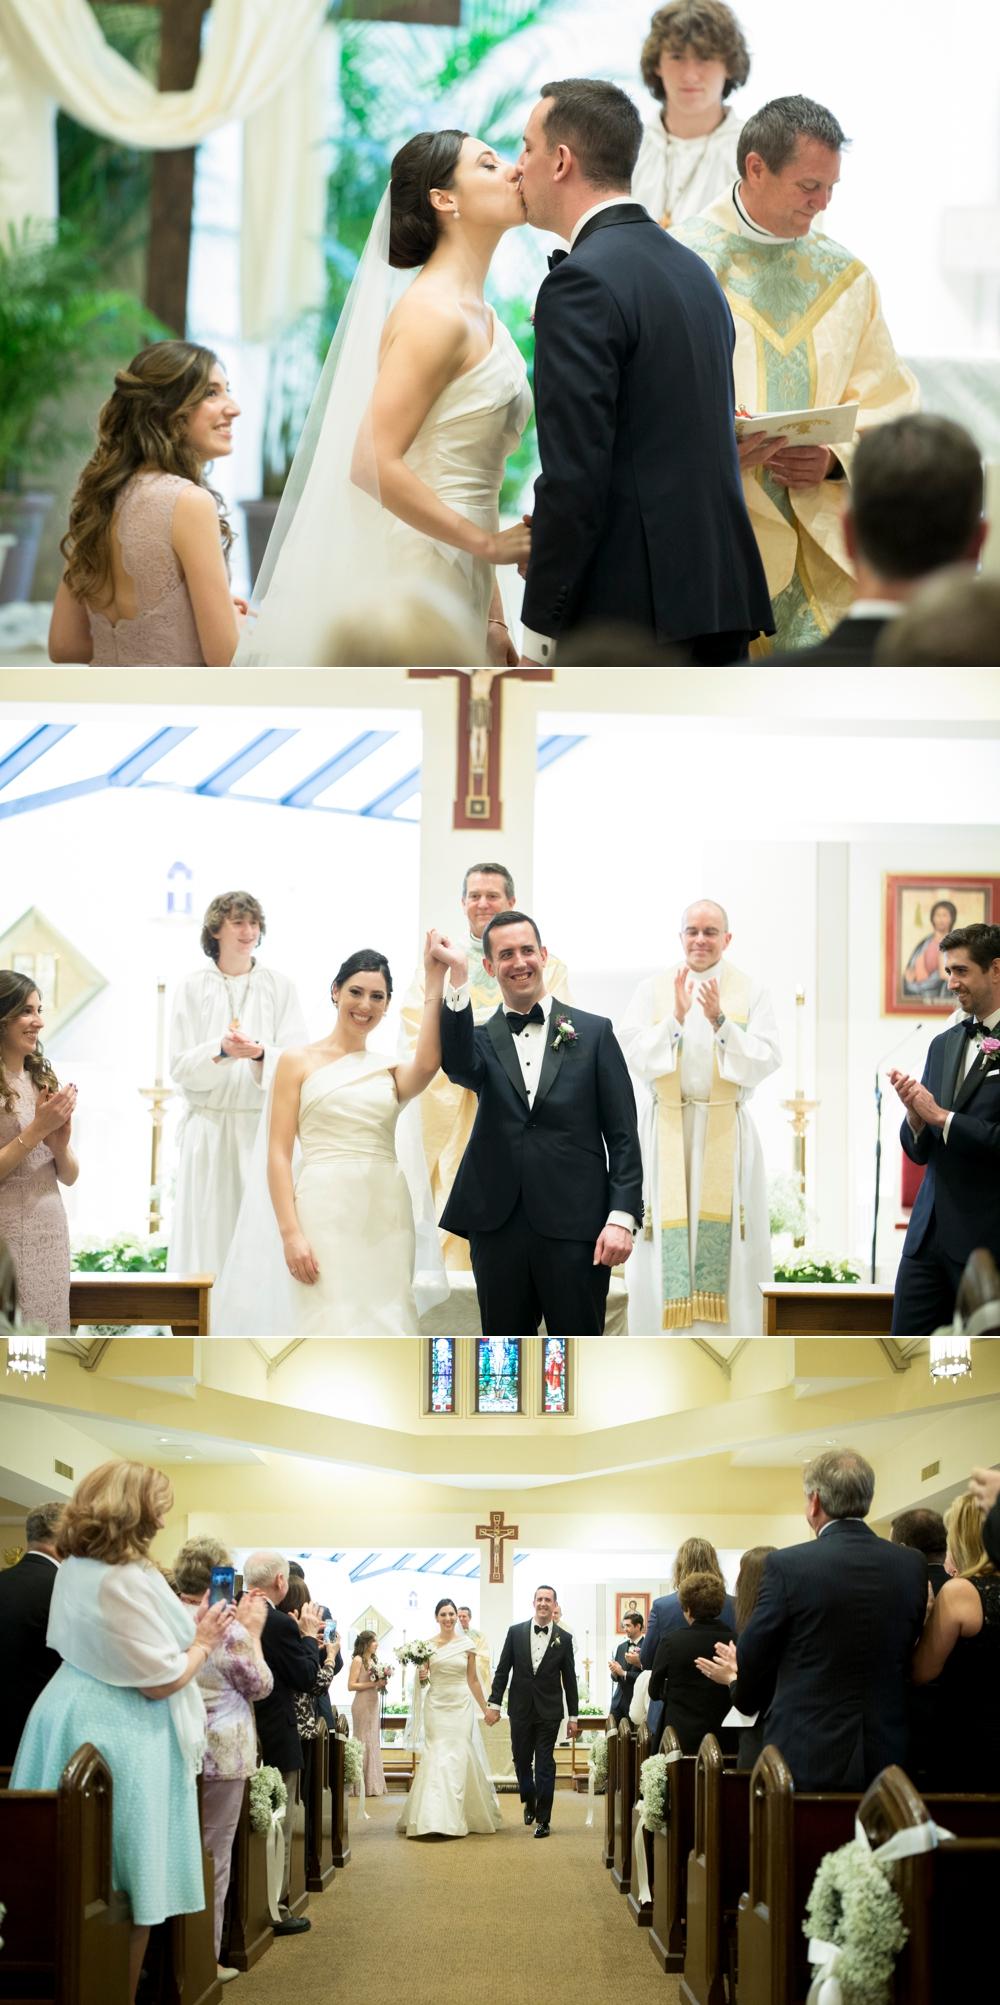 EoilaMansion_Wedding_Leah&Tom_0019.jpg